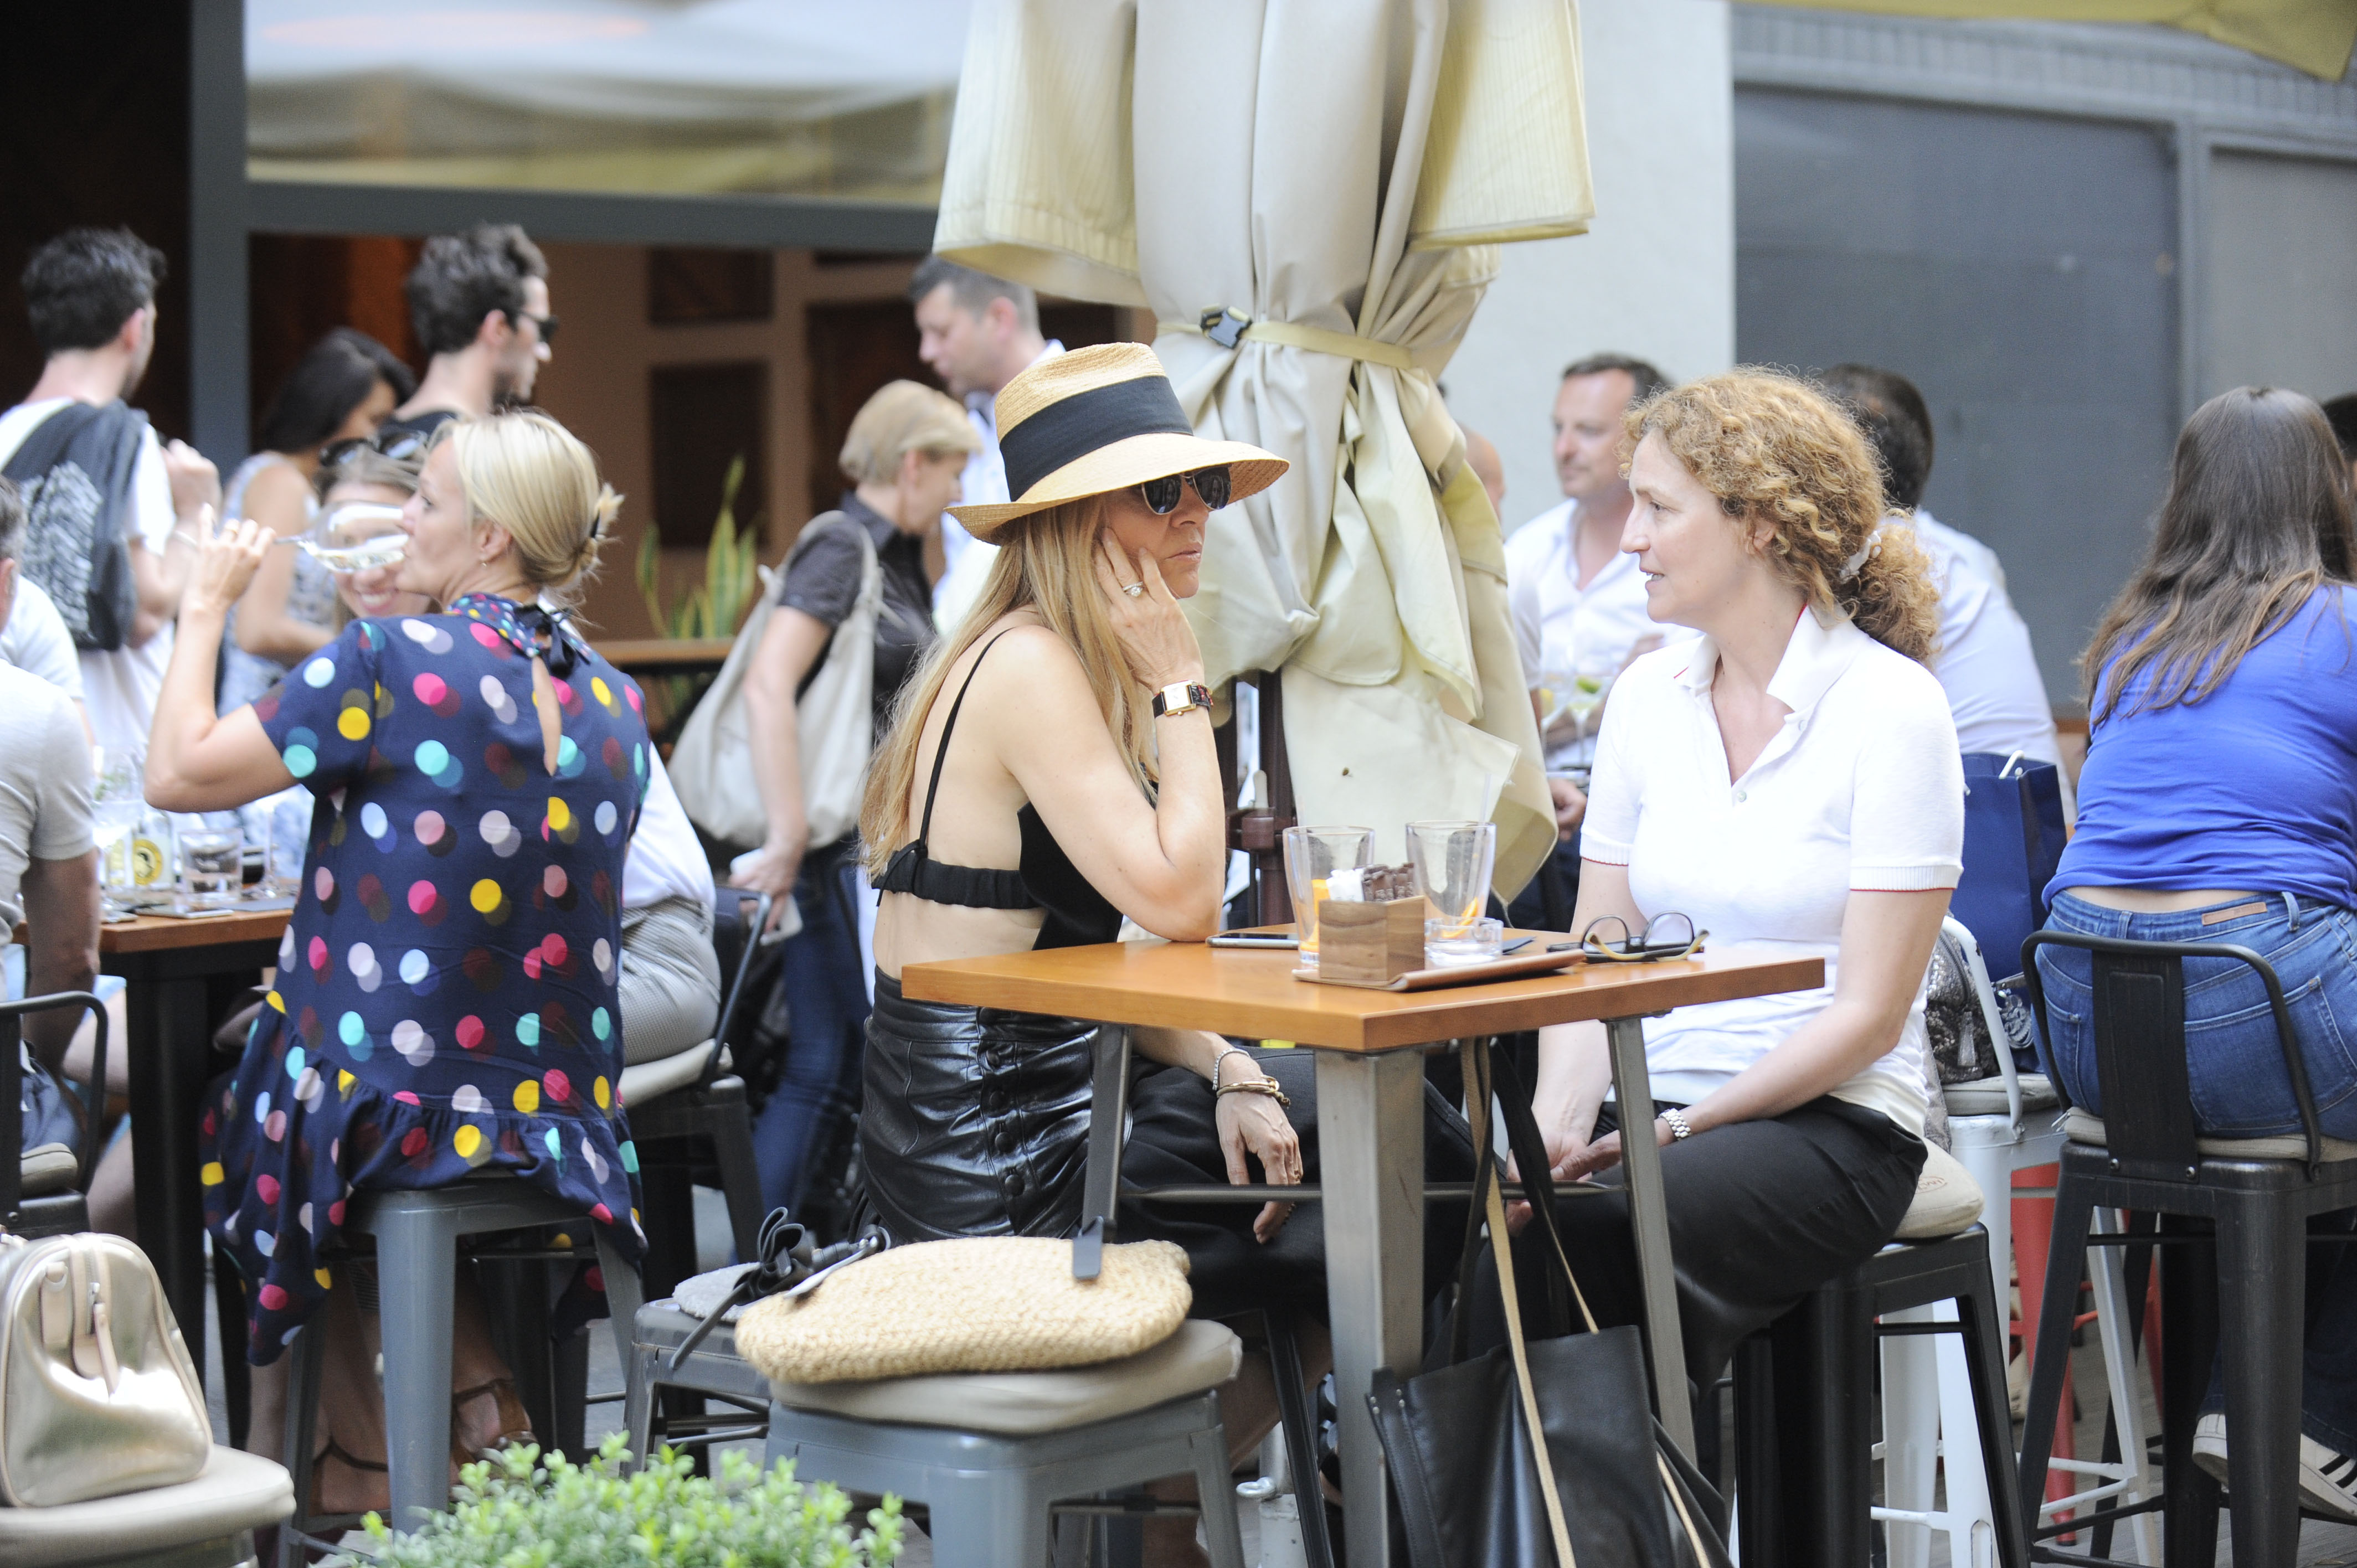 Spica / Zagreb 19.06.2017. / foto: Davor Matota / Maja Tedeschi